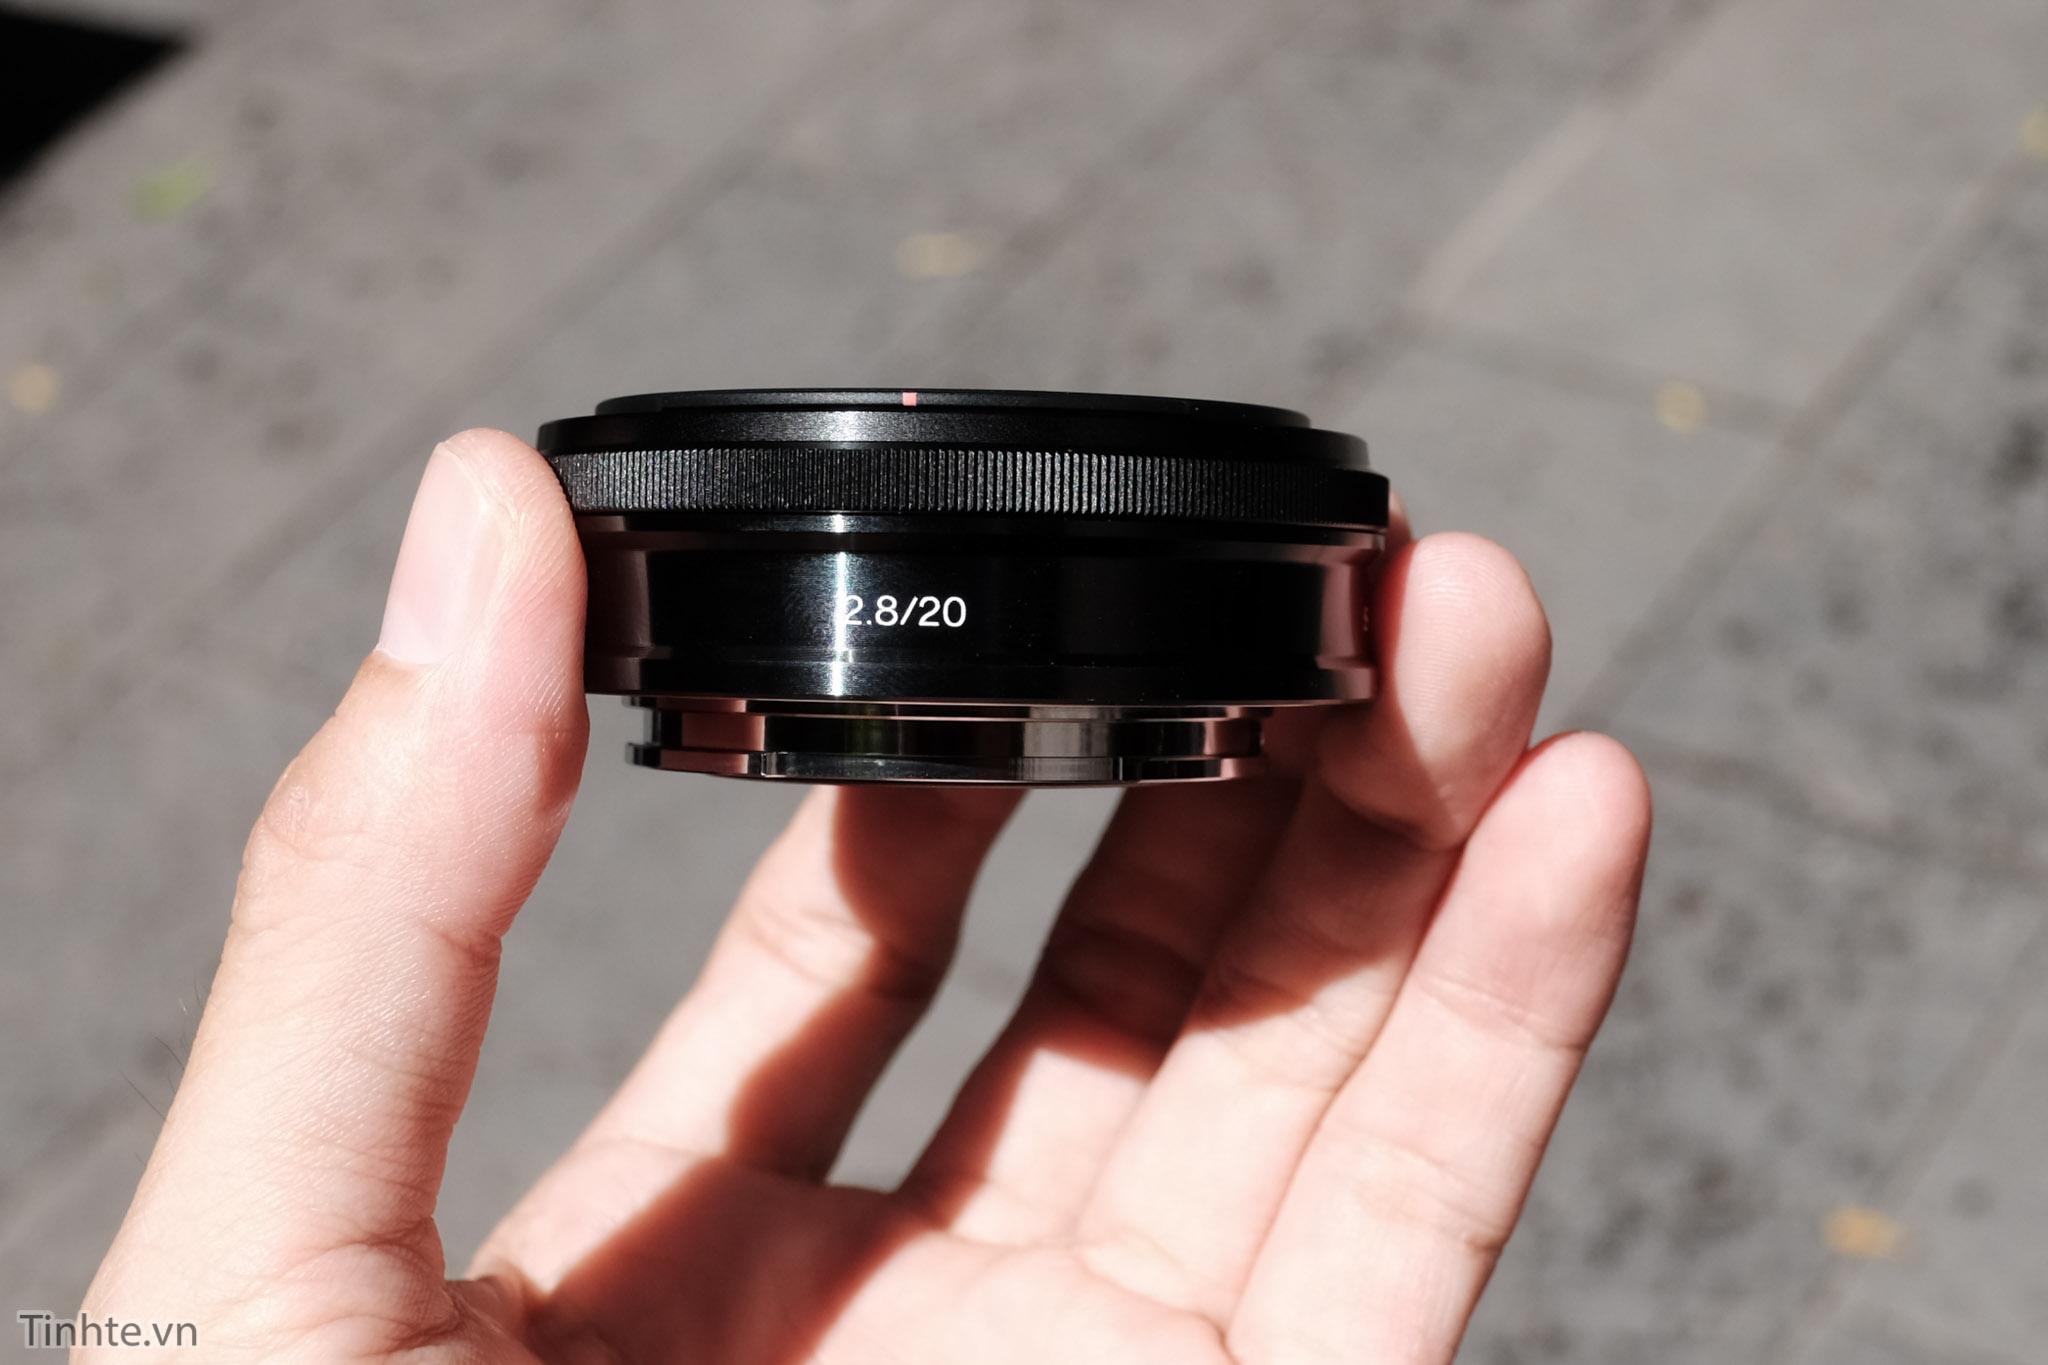 Sony-SEL-20mm-F2.8-Tinhte-13.jpg